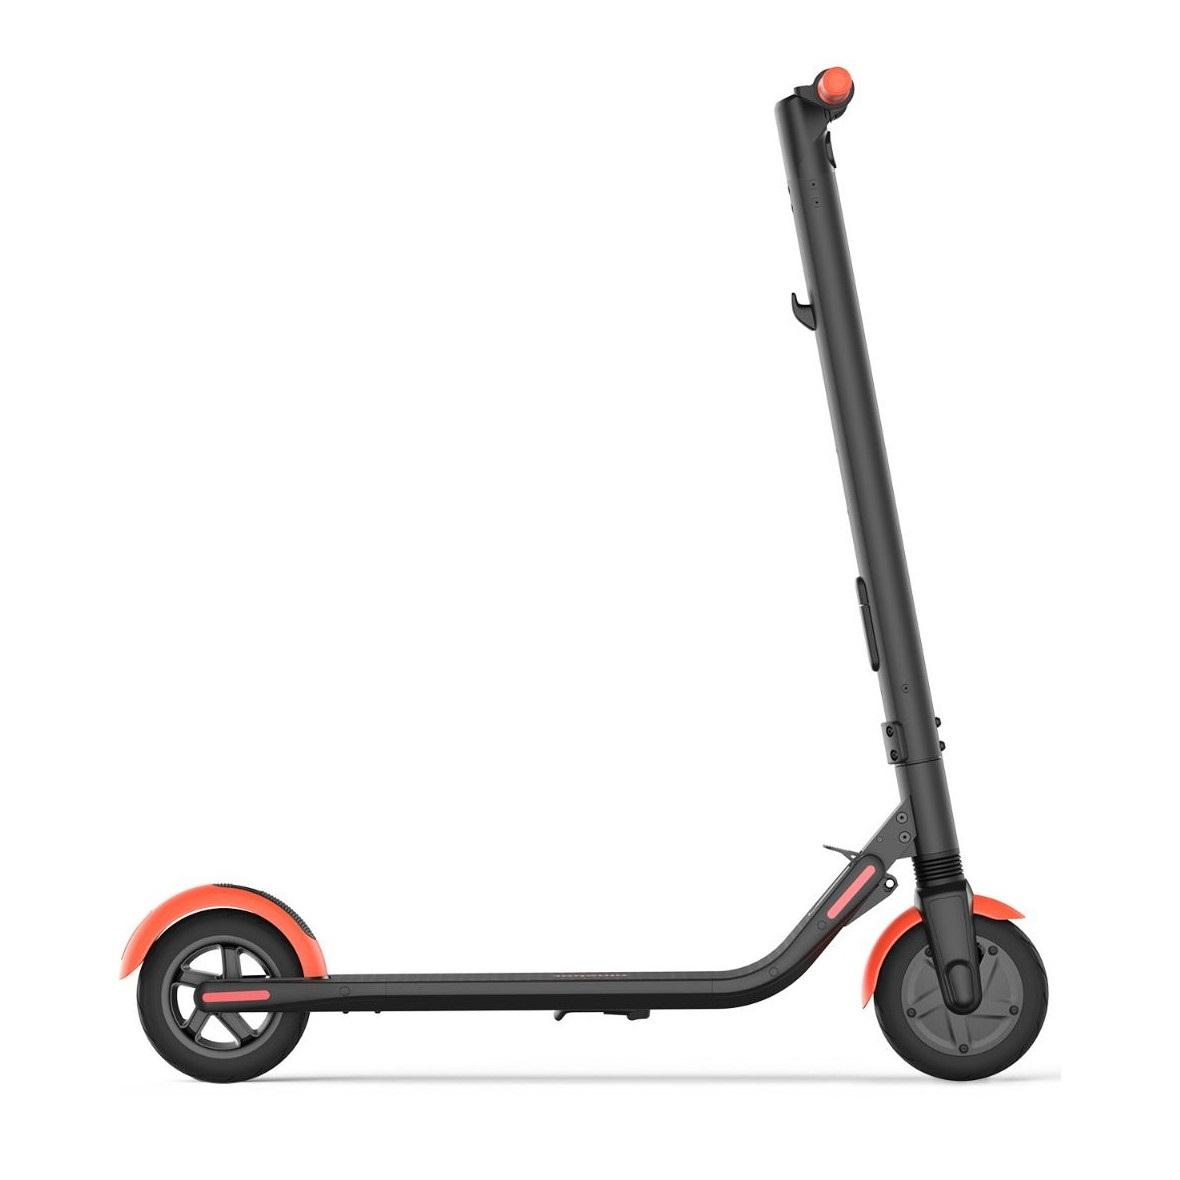 https://igiroskuter.ru/images/upload/1%20Электросамокат%20Ninebot%20KickScooter%20ES1L.jpg